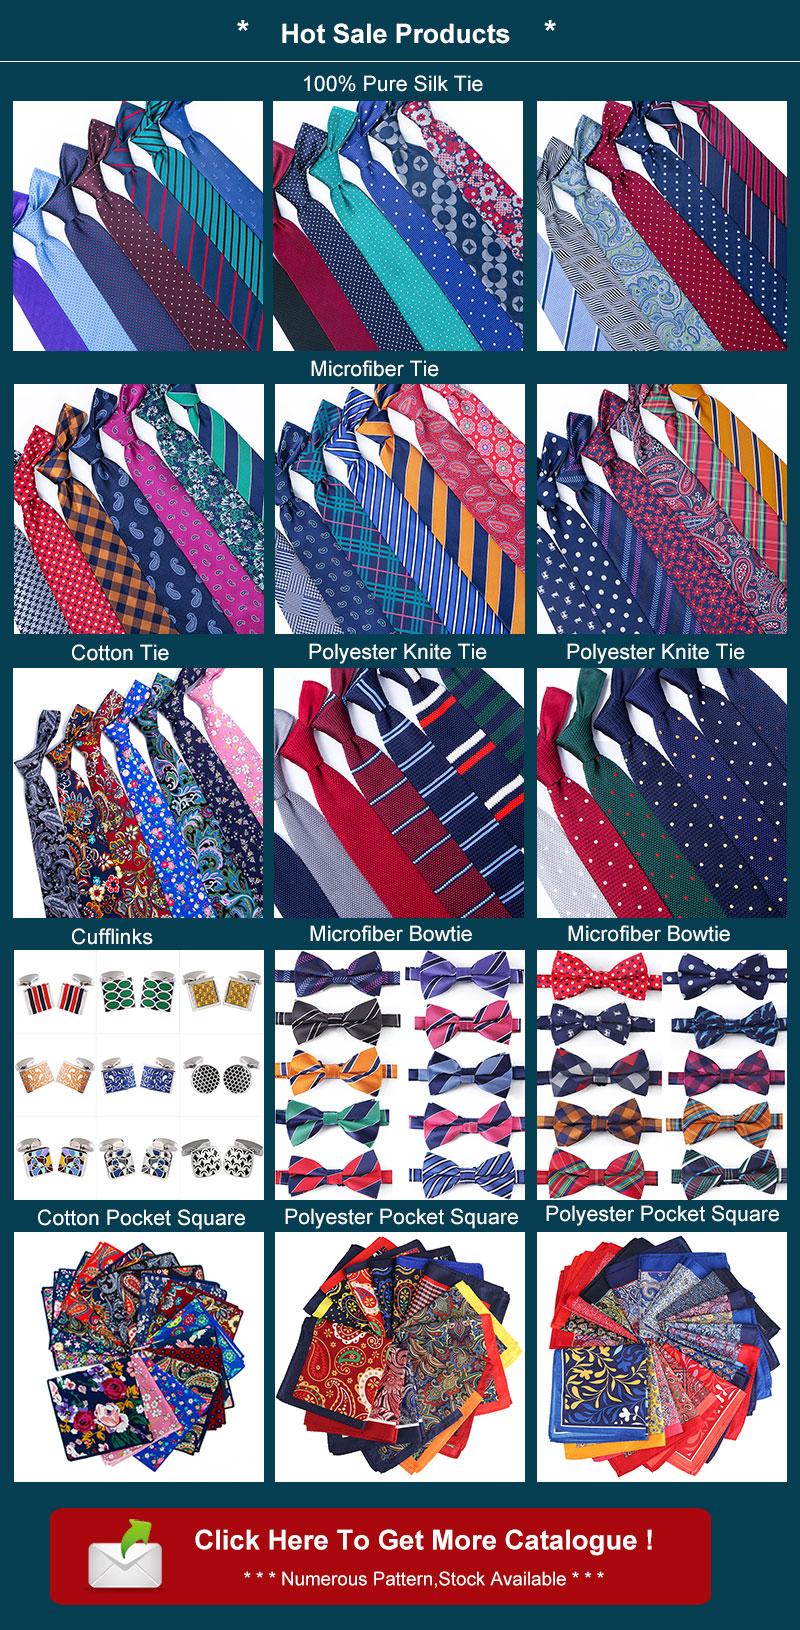 2018 hombres de alta calidad de Corbata de punto de moda Corbata rojo y azul oscuro Corbata de punto de